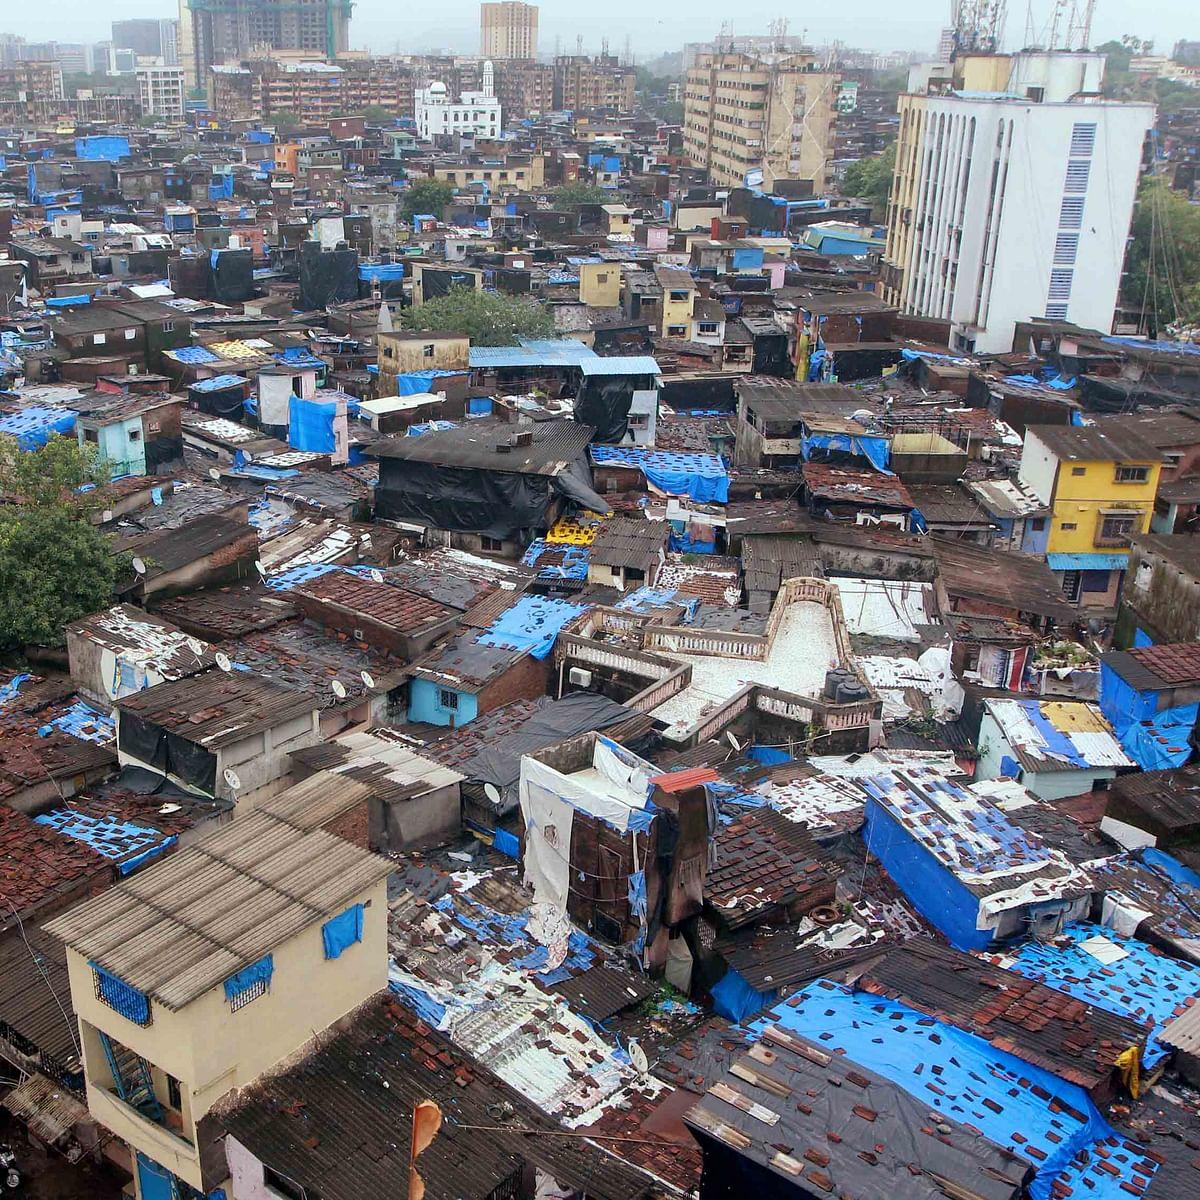 Maharashtra govt has sought tax concession from Centre for slum rehabilitation programme: National Real Estate Development Council